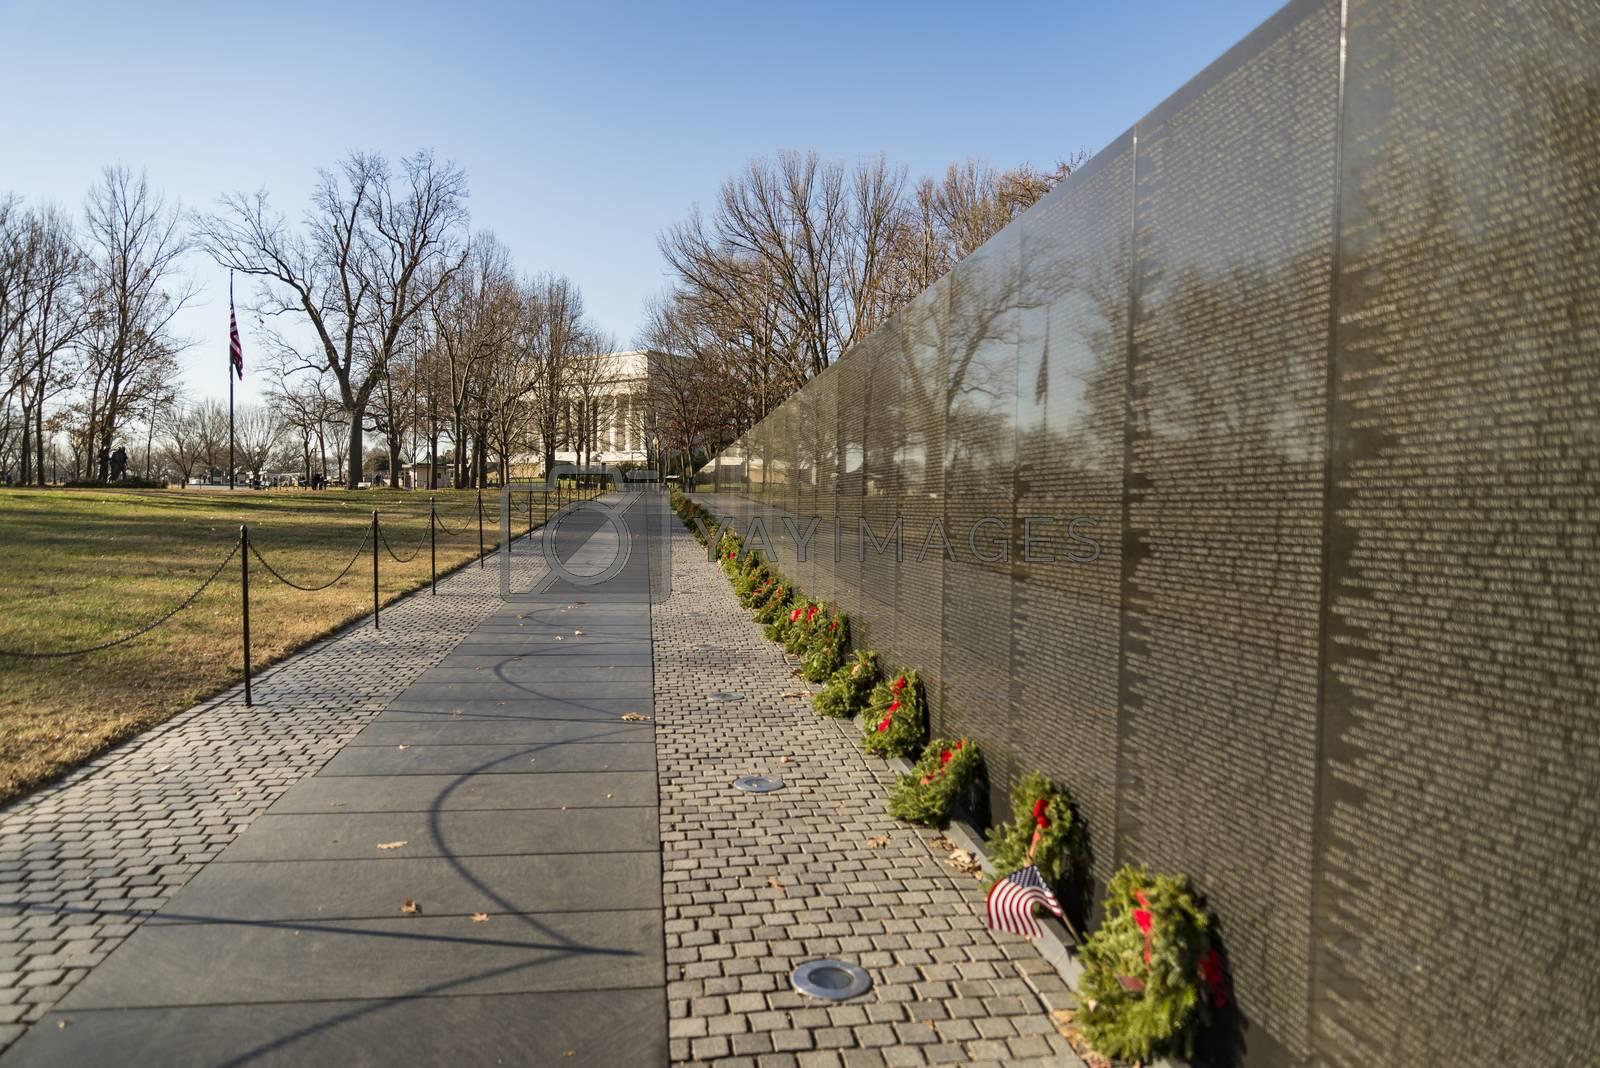 WASHINGTON DC -December 17, 2017: Names on Vietnam War Veterans Memorial on December 17, 2017 in Washington DC, USA. The memorial receives around 3 million visitors each year.